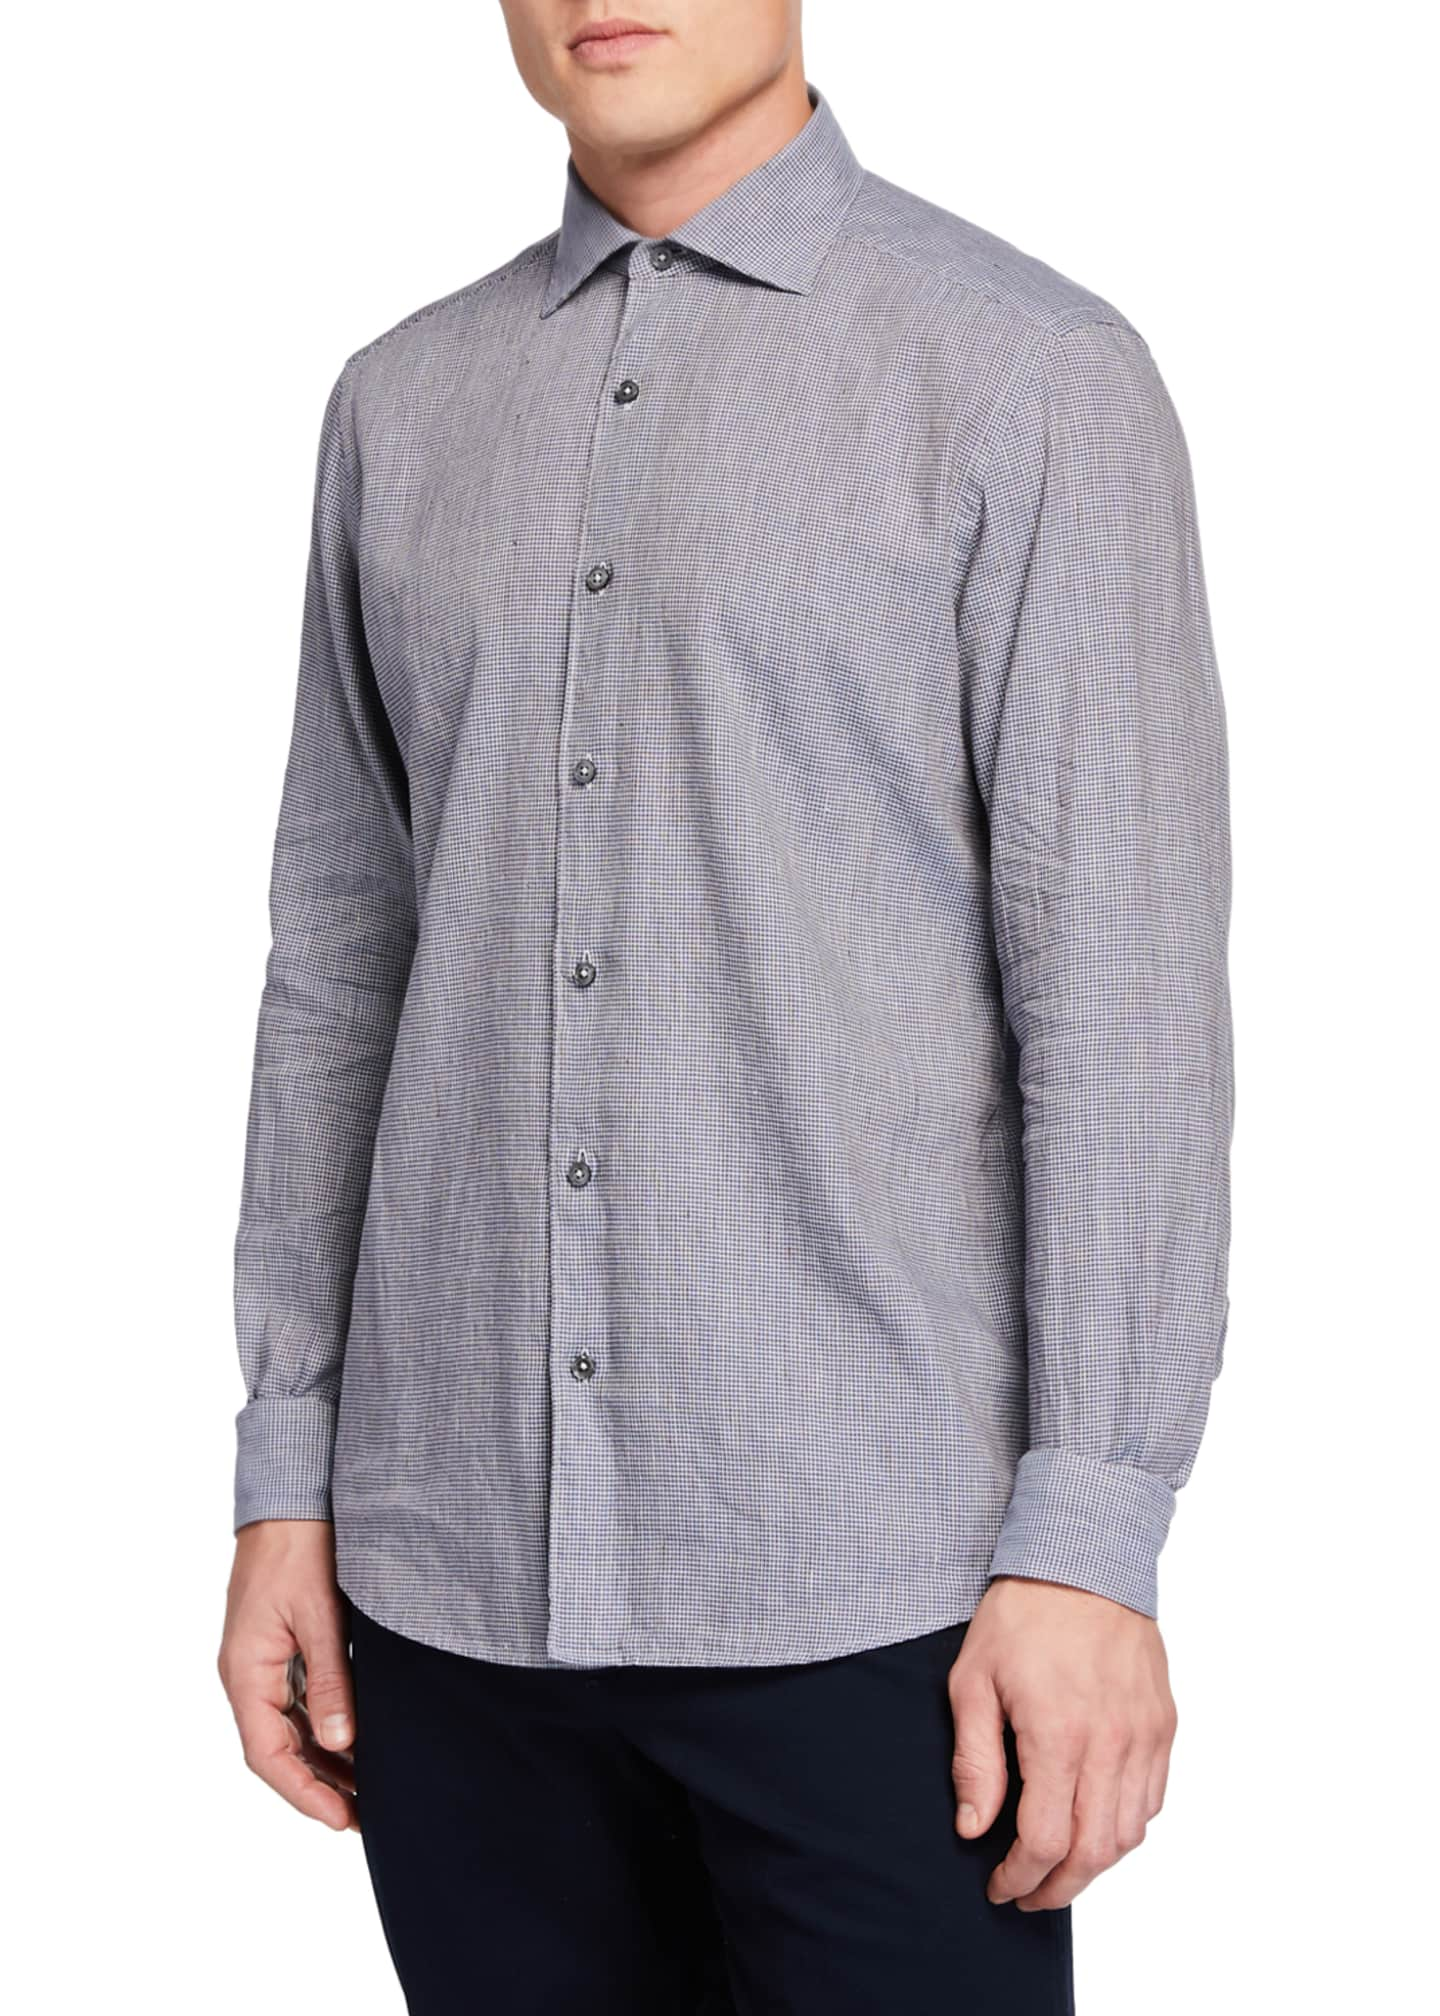 Ermenegildo Zegna Men's Long-Sleeve Houndstooth Sport Shirt